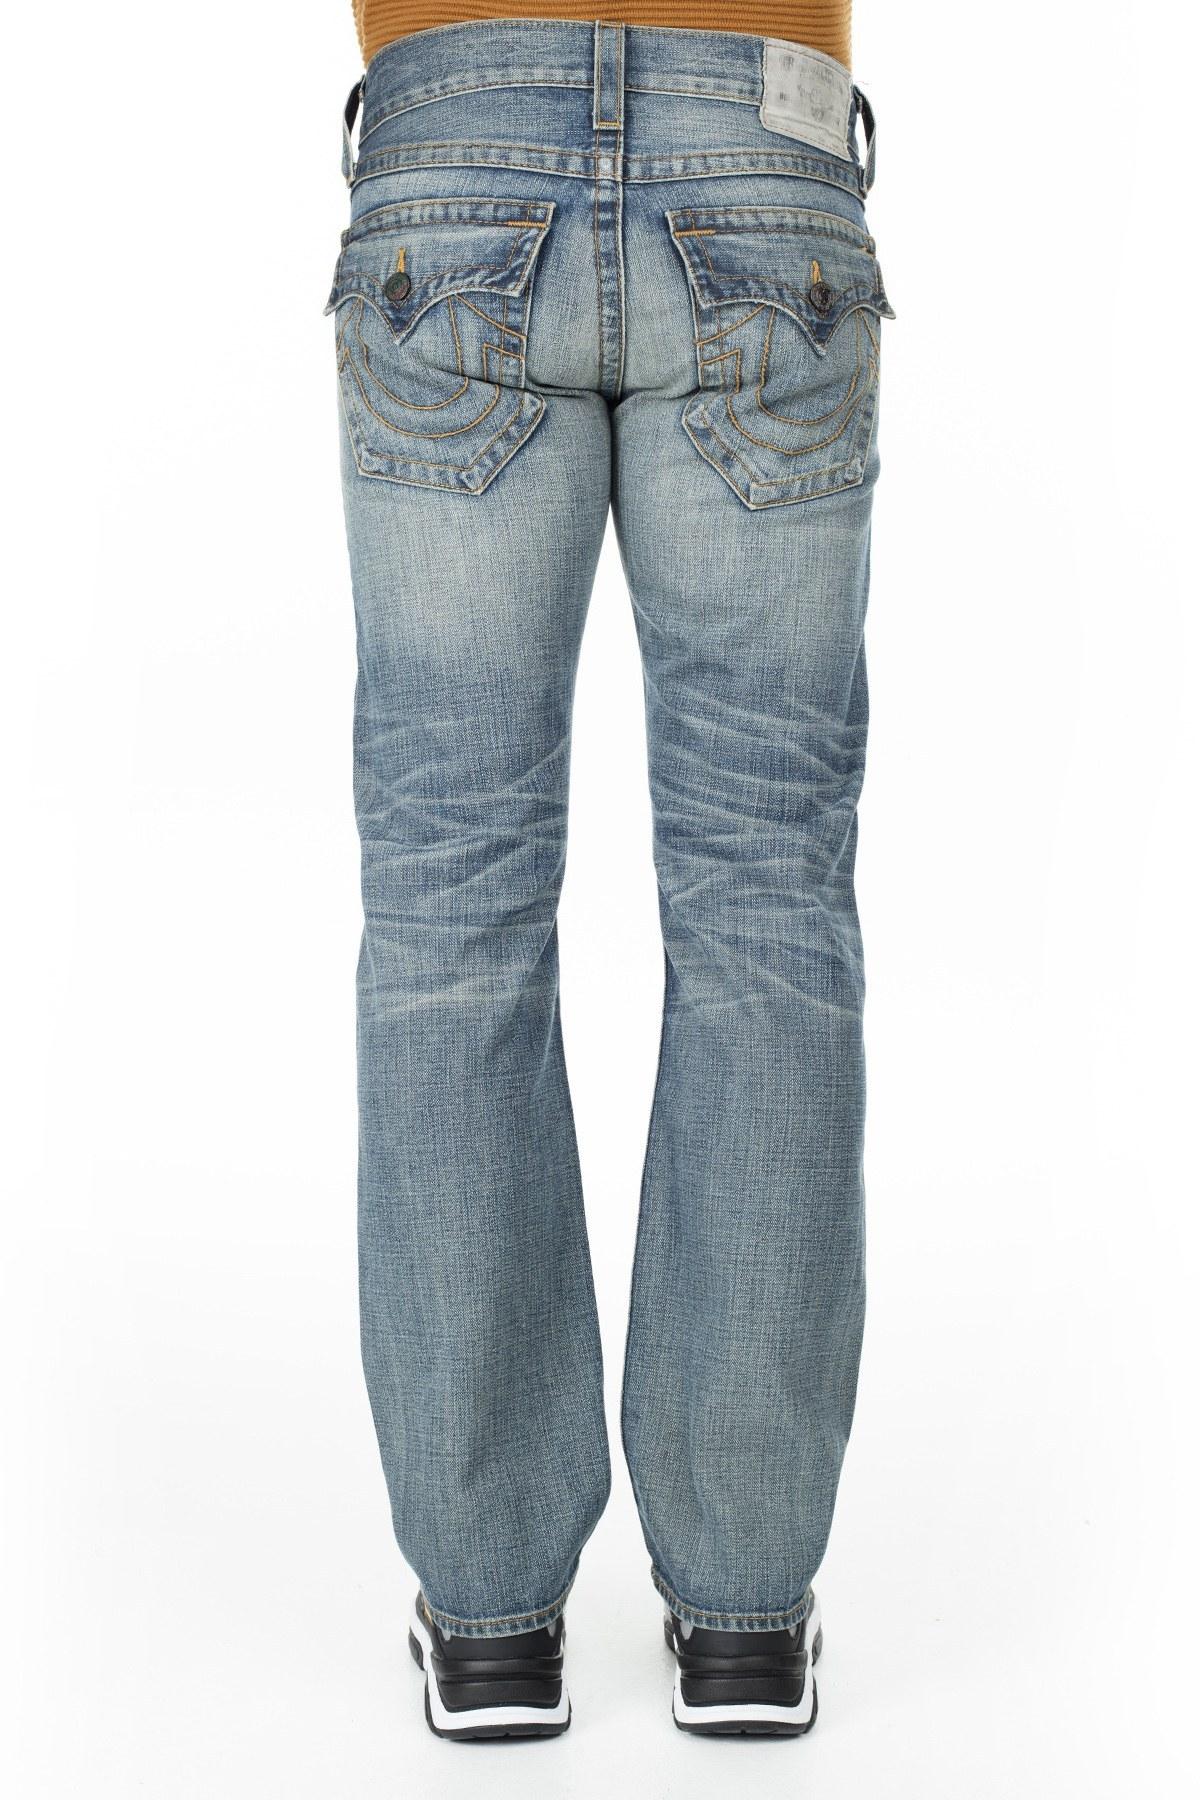 True Religion Jeans Erkek Kot Pantolon MJW859S34 İNDİGO